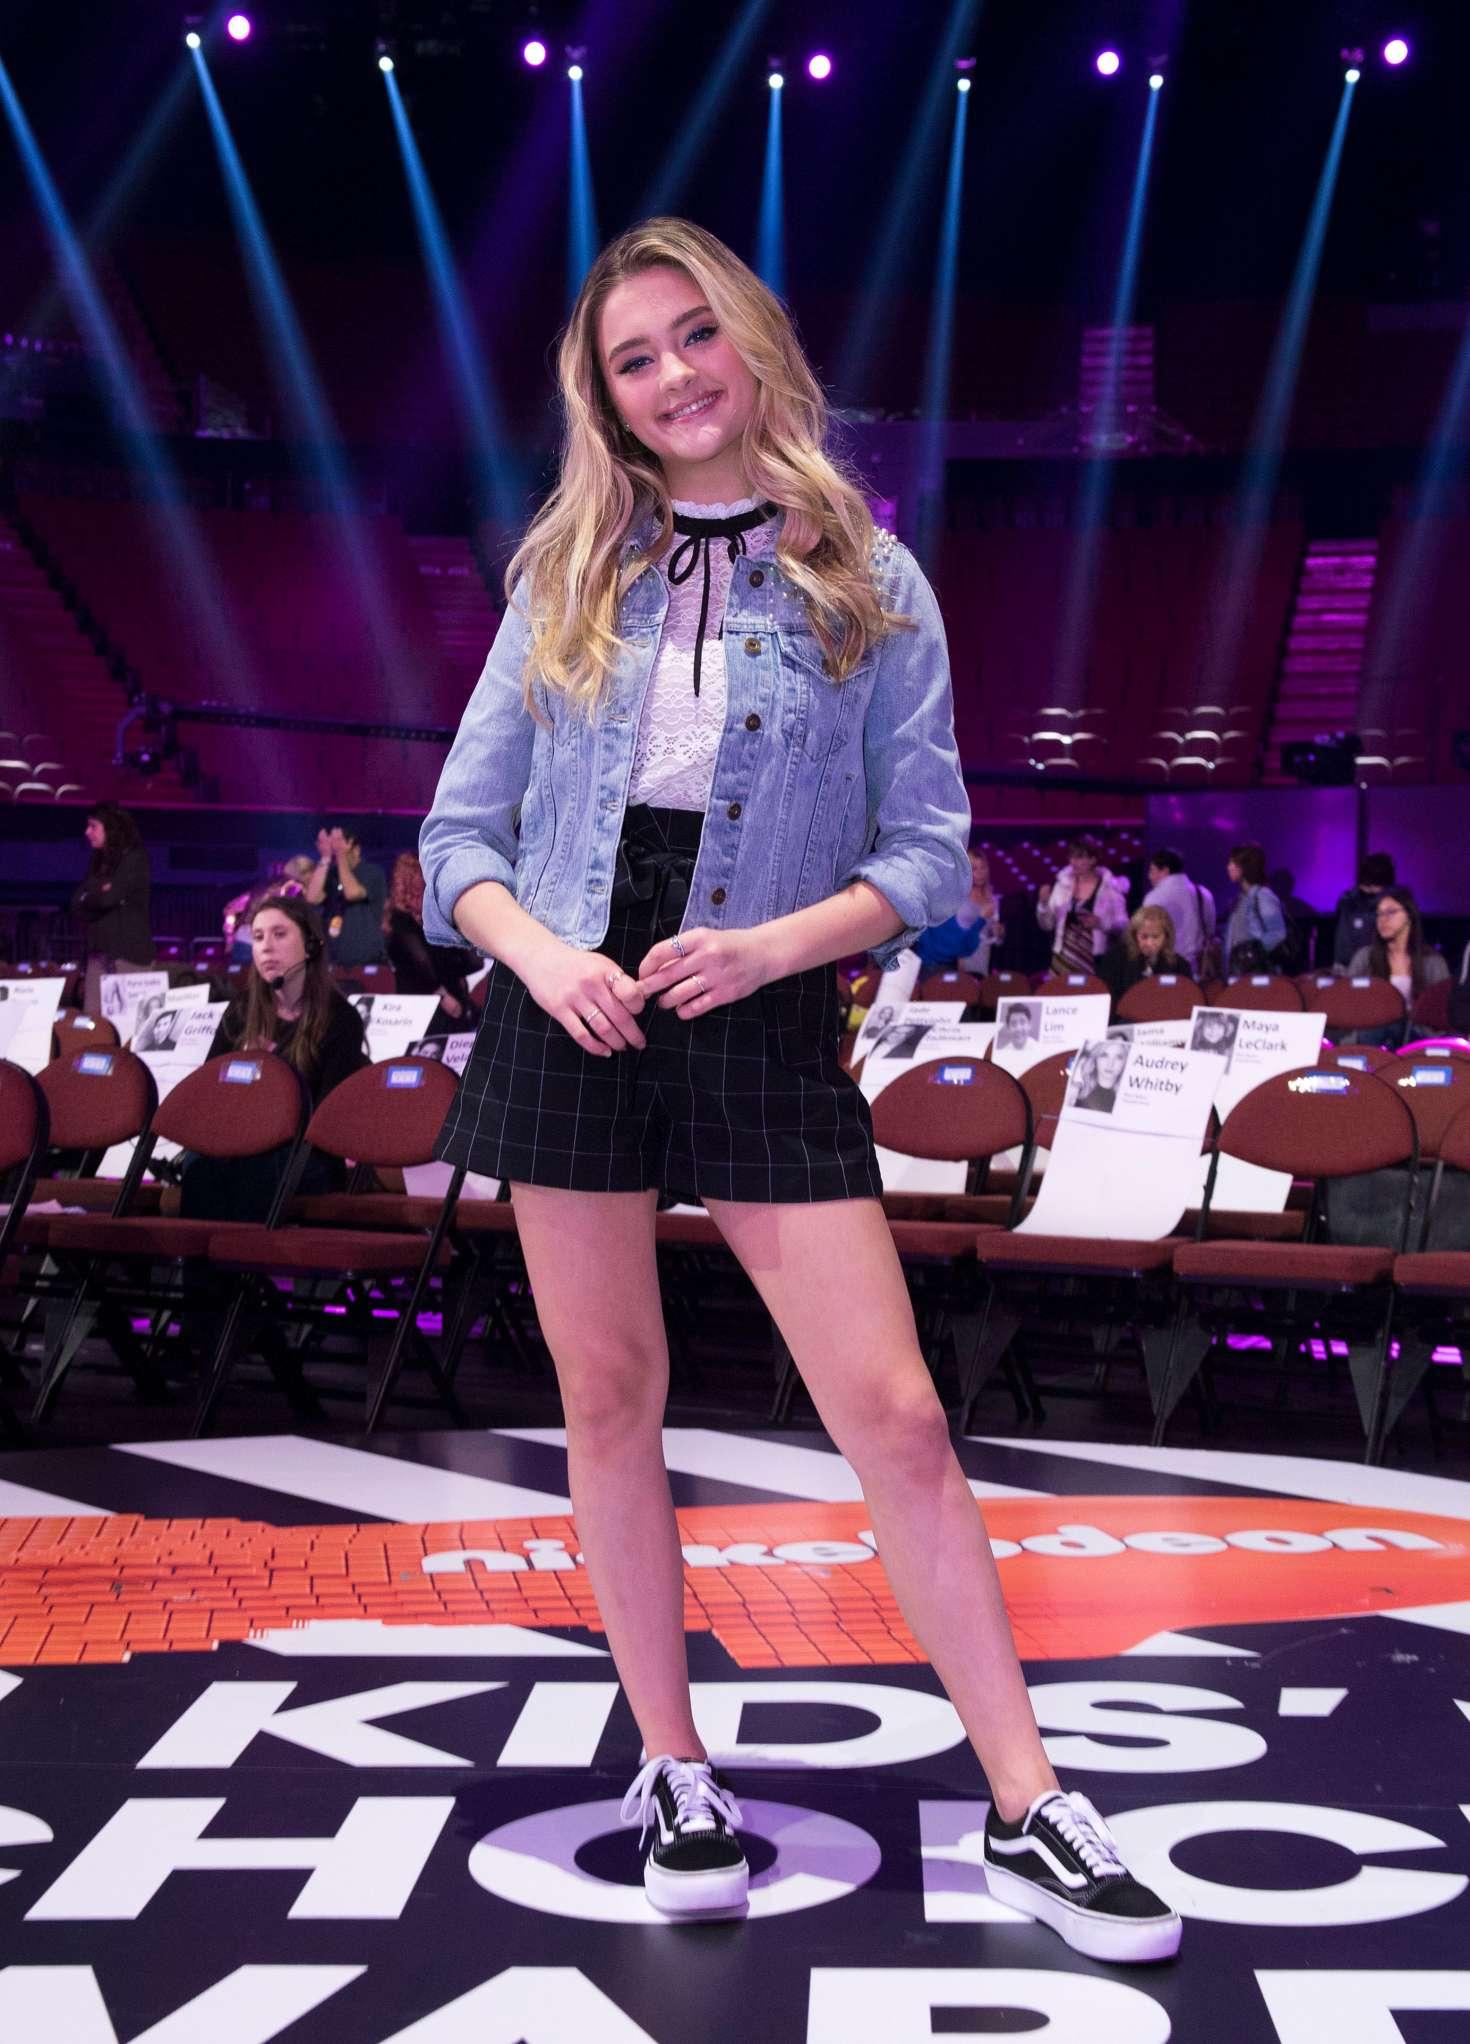 Lizzy Greene - 2018 Kids' Choice Awards Press Junket in Inglewood